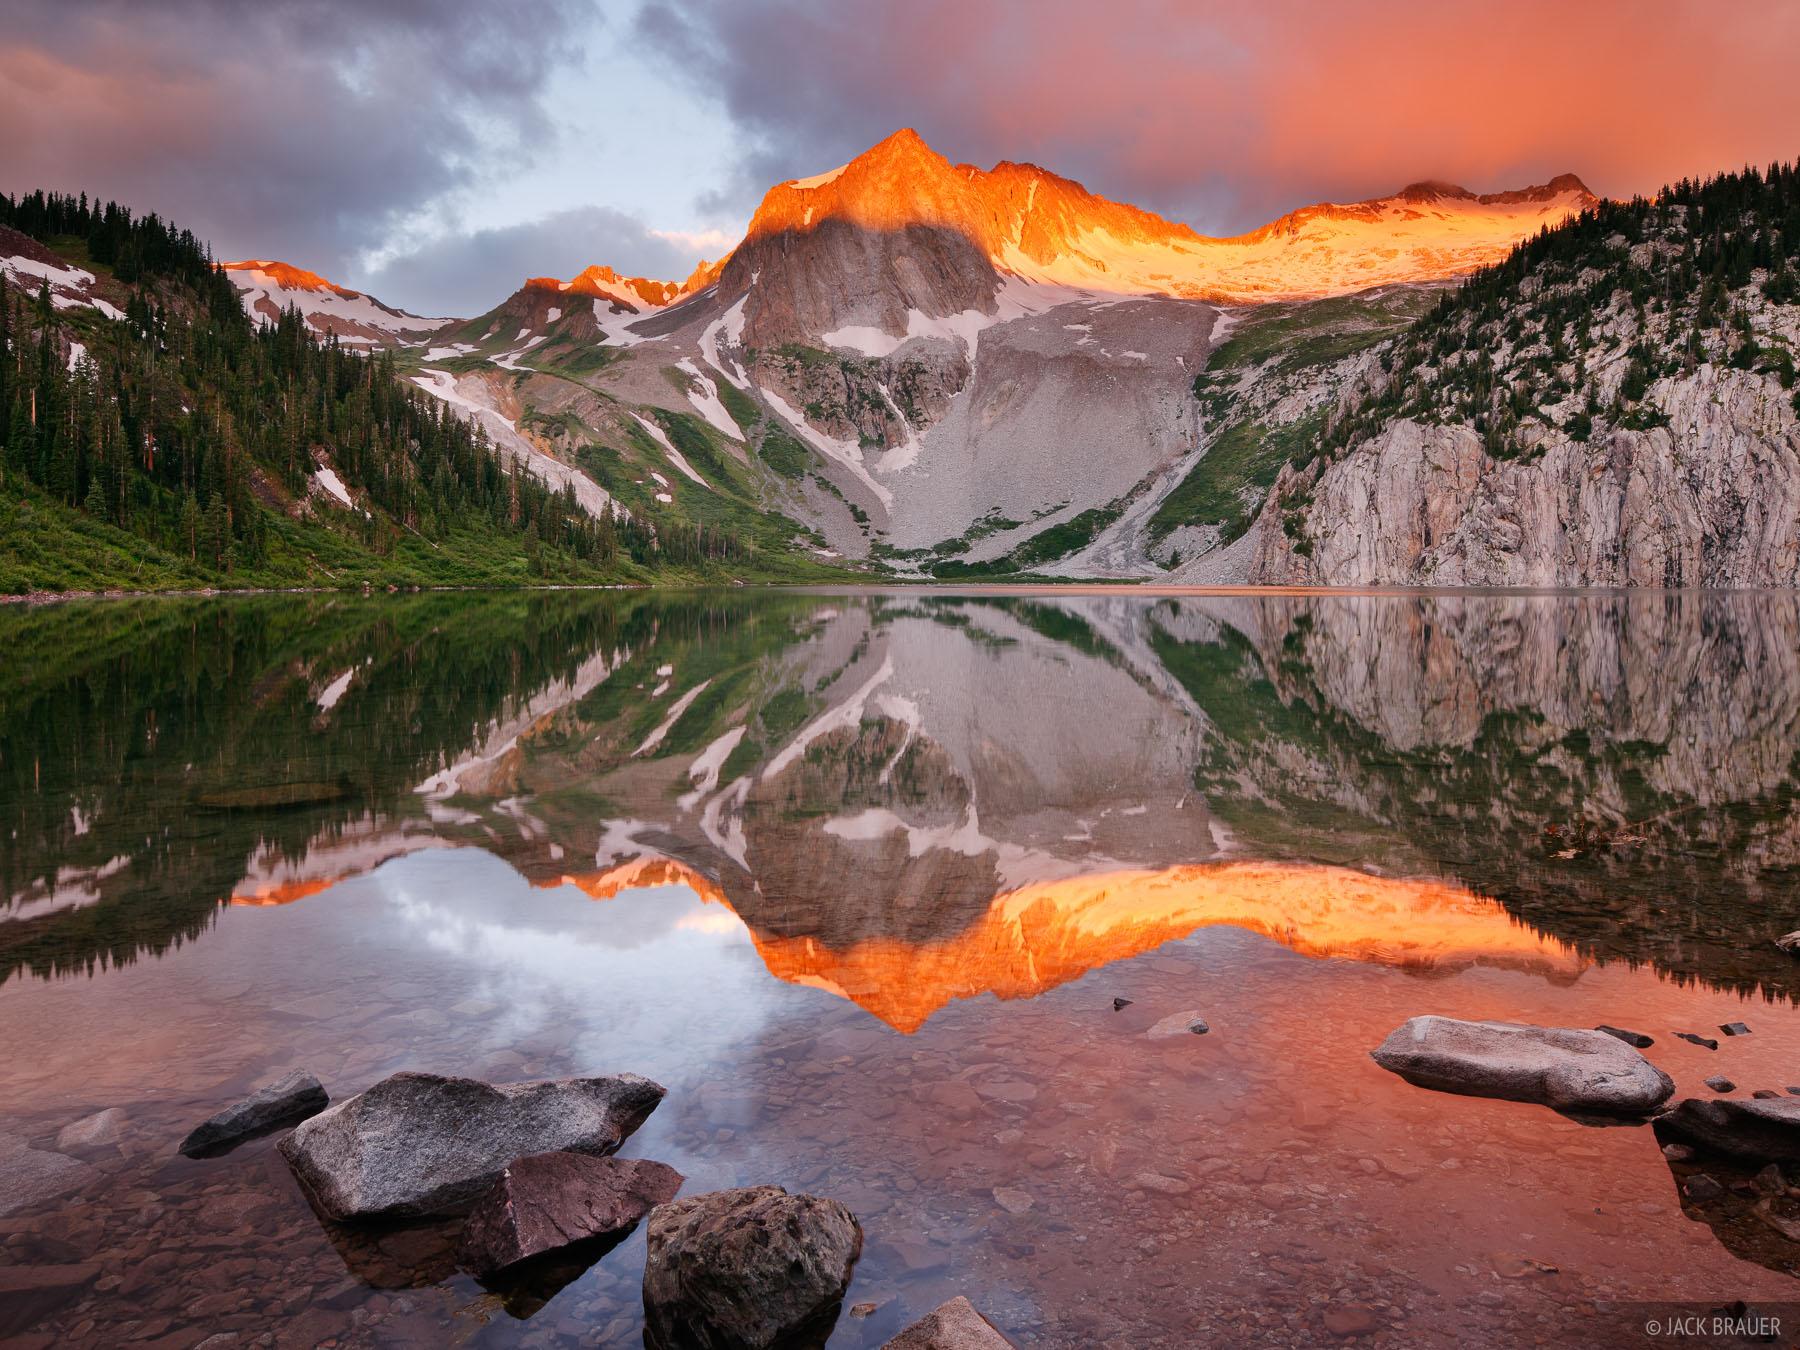 Colorado, Elk Mountains, Snowmass, Maroon Bells-Snowmass Wilderness, photo